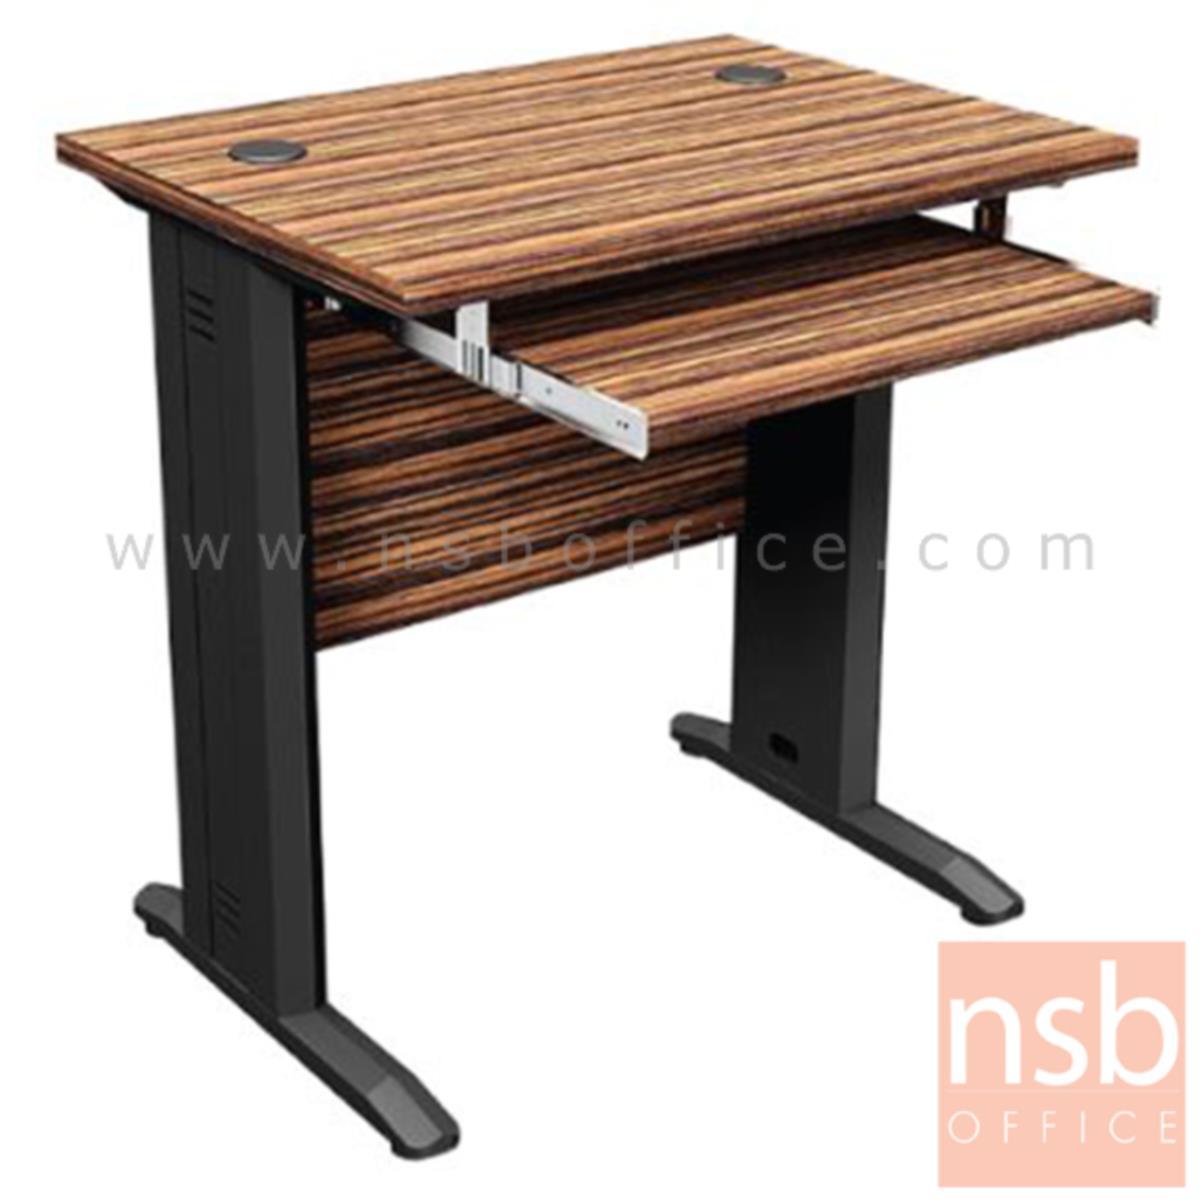 A26A024:โต๊ะคอมพิวเตอร์  รุ่น Timebelle (ไทม์เบลล์) ขนาด 80W cm.  ขาเหล็ก สีลายไม้ซีบราโน่ตัดดำ ขอบ ROSEGOLD